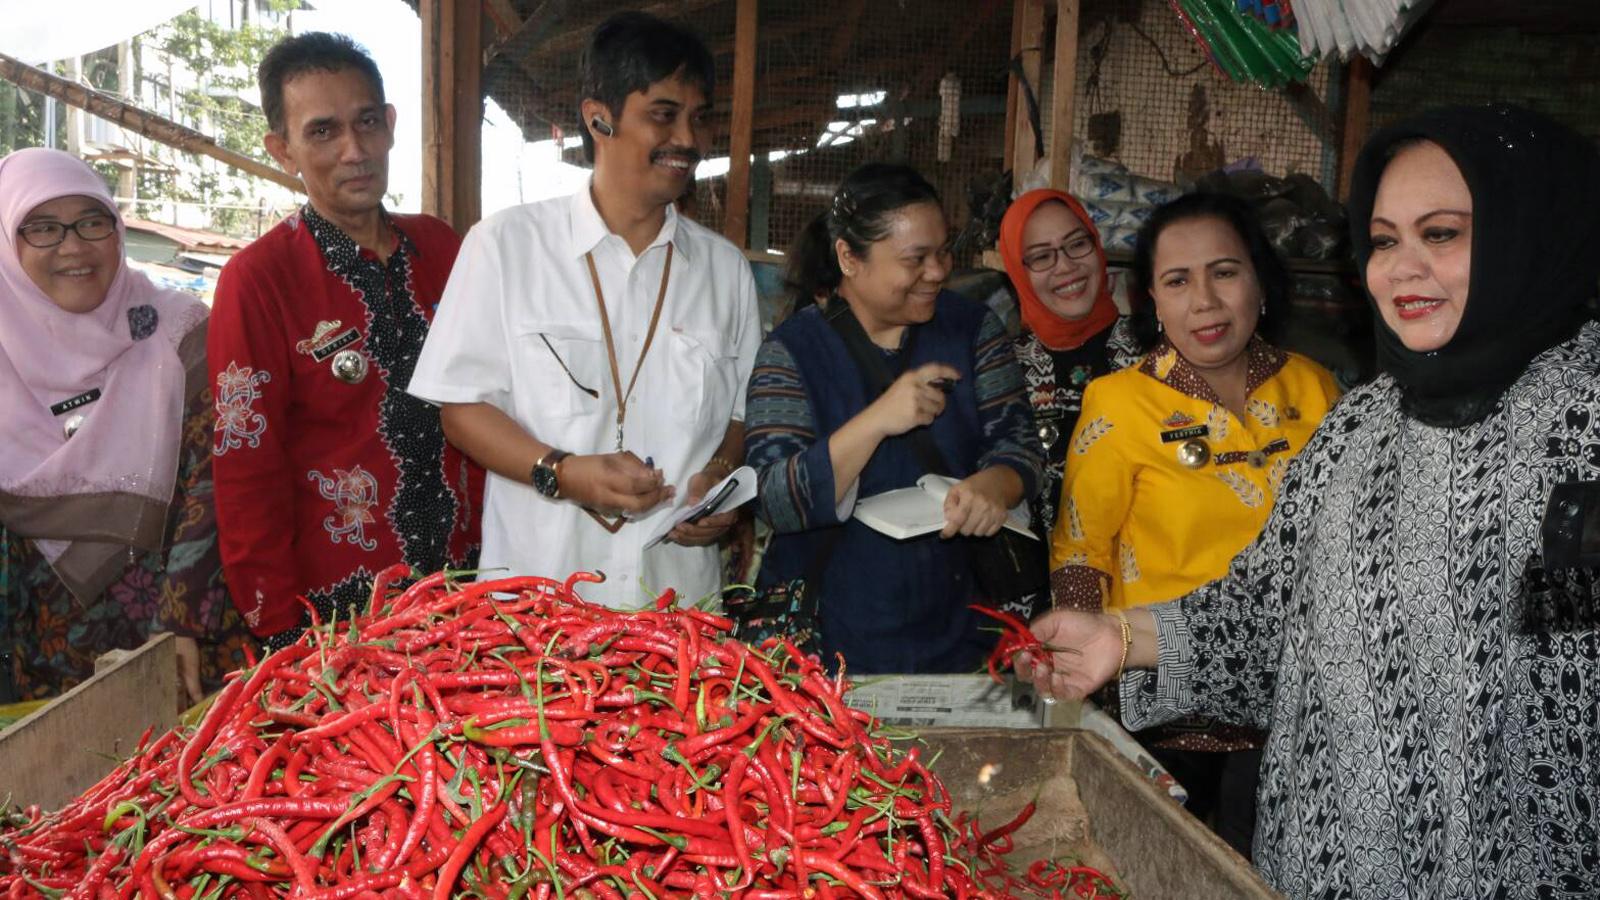 staf Ahli Menteri Perdagangan Bidang Perdagangan Jasa, Lasminingsih (berjilbab hitam) saat meninjau Pasar Pasir Gintung. (Lampungnews/Davit)